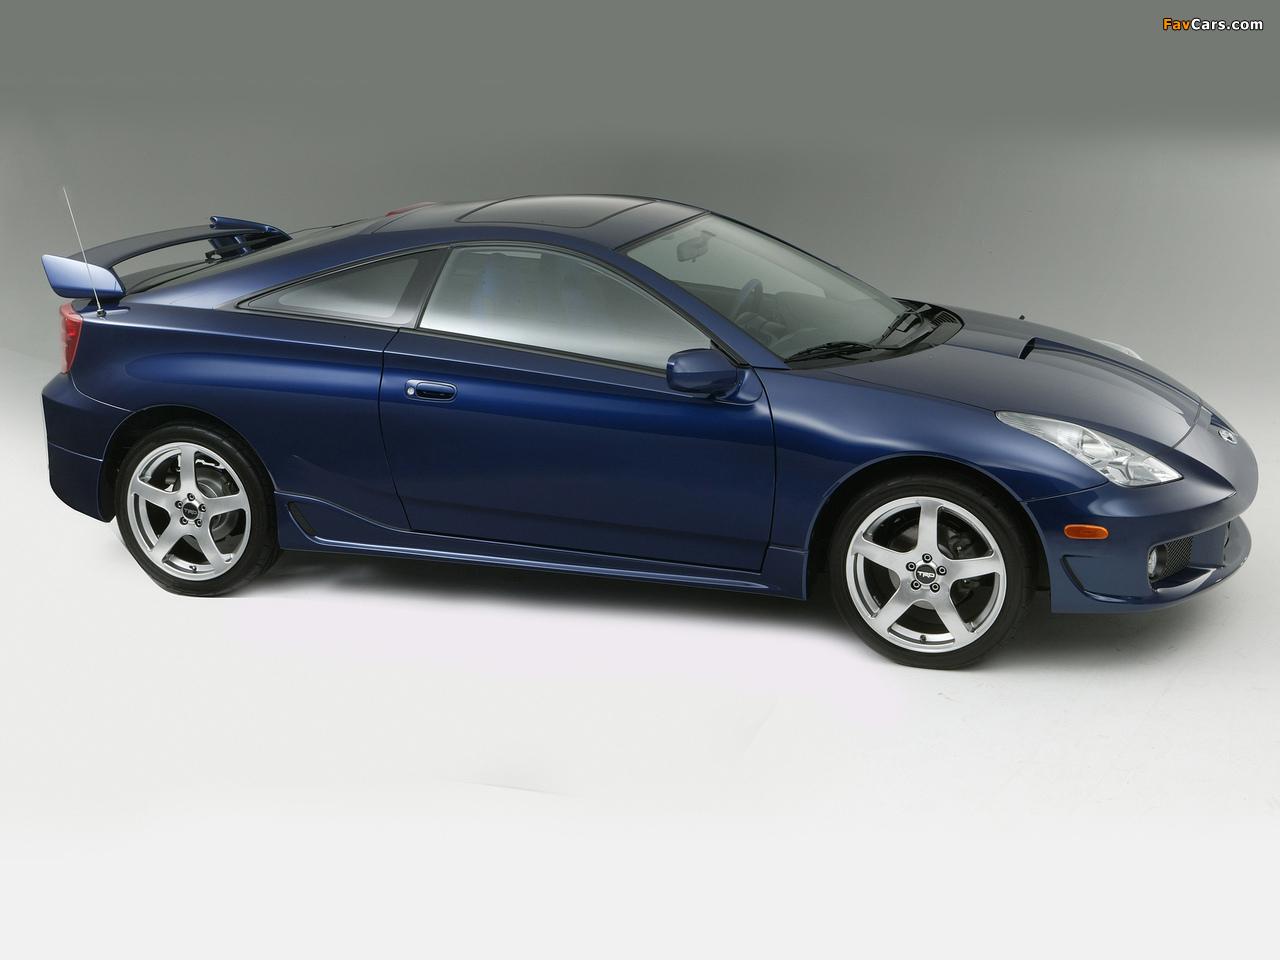 Celica Trd >> Wallpapers of TRD Toyota Celica GT-S Tsunami 2004–06 (1280x960)